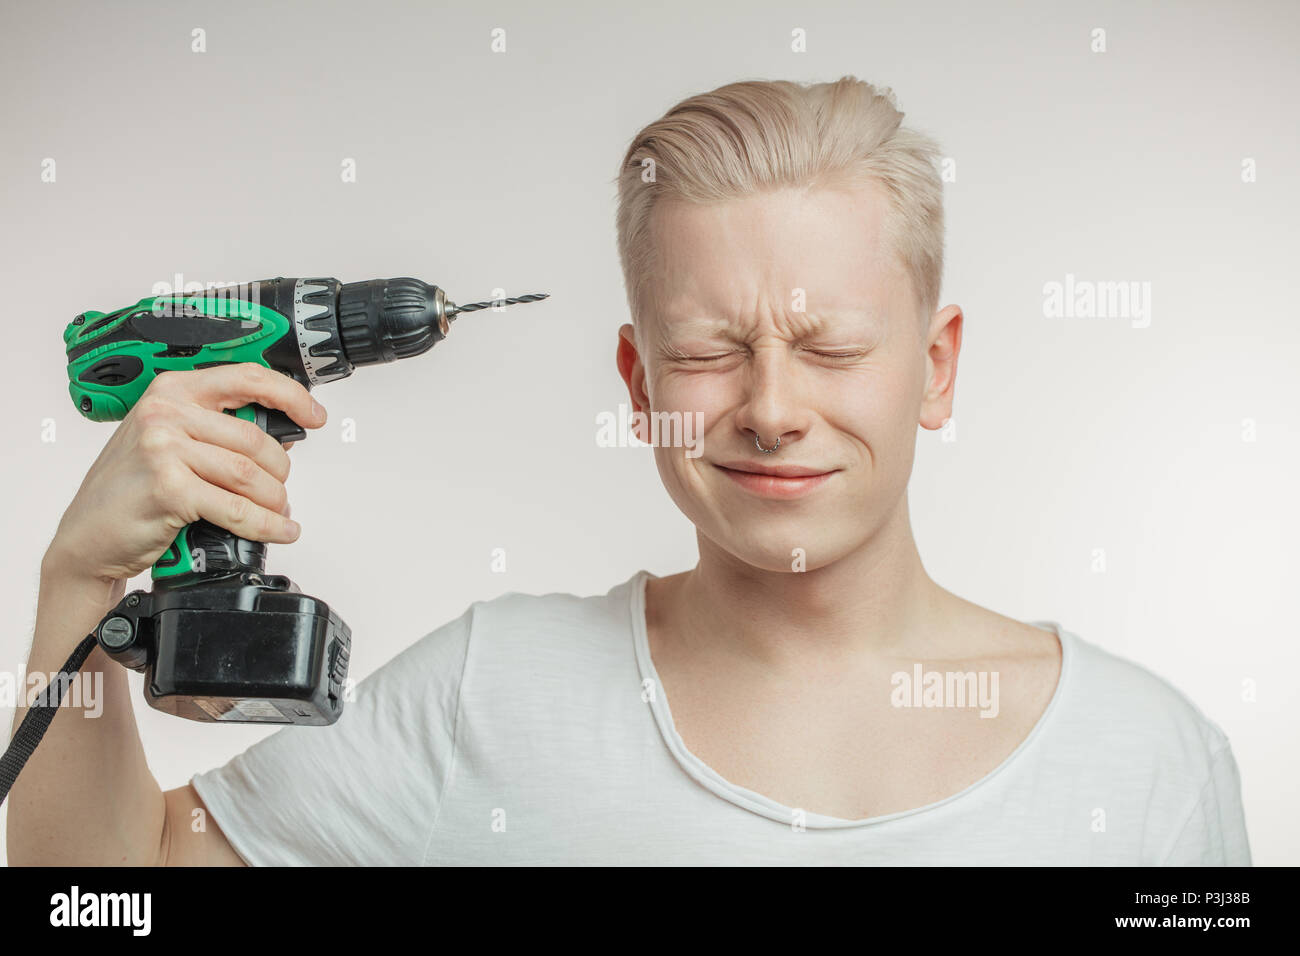 Man drilling a temple. Migraine, headache and masochism concept. Studio shot. - Stock Image